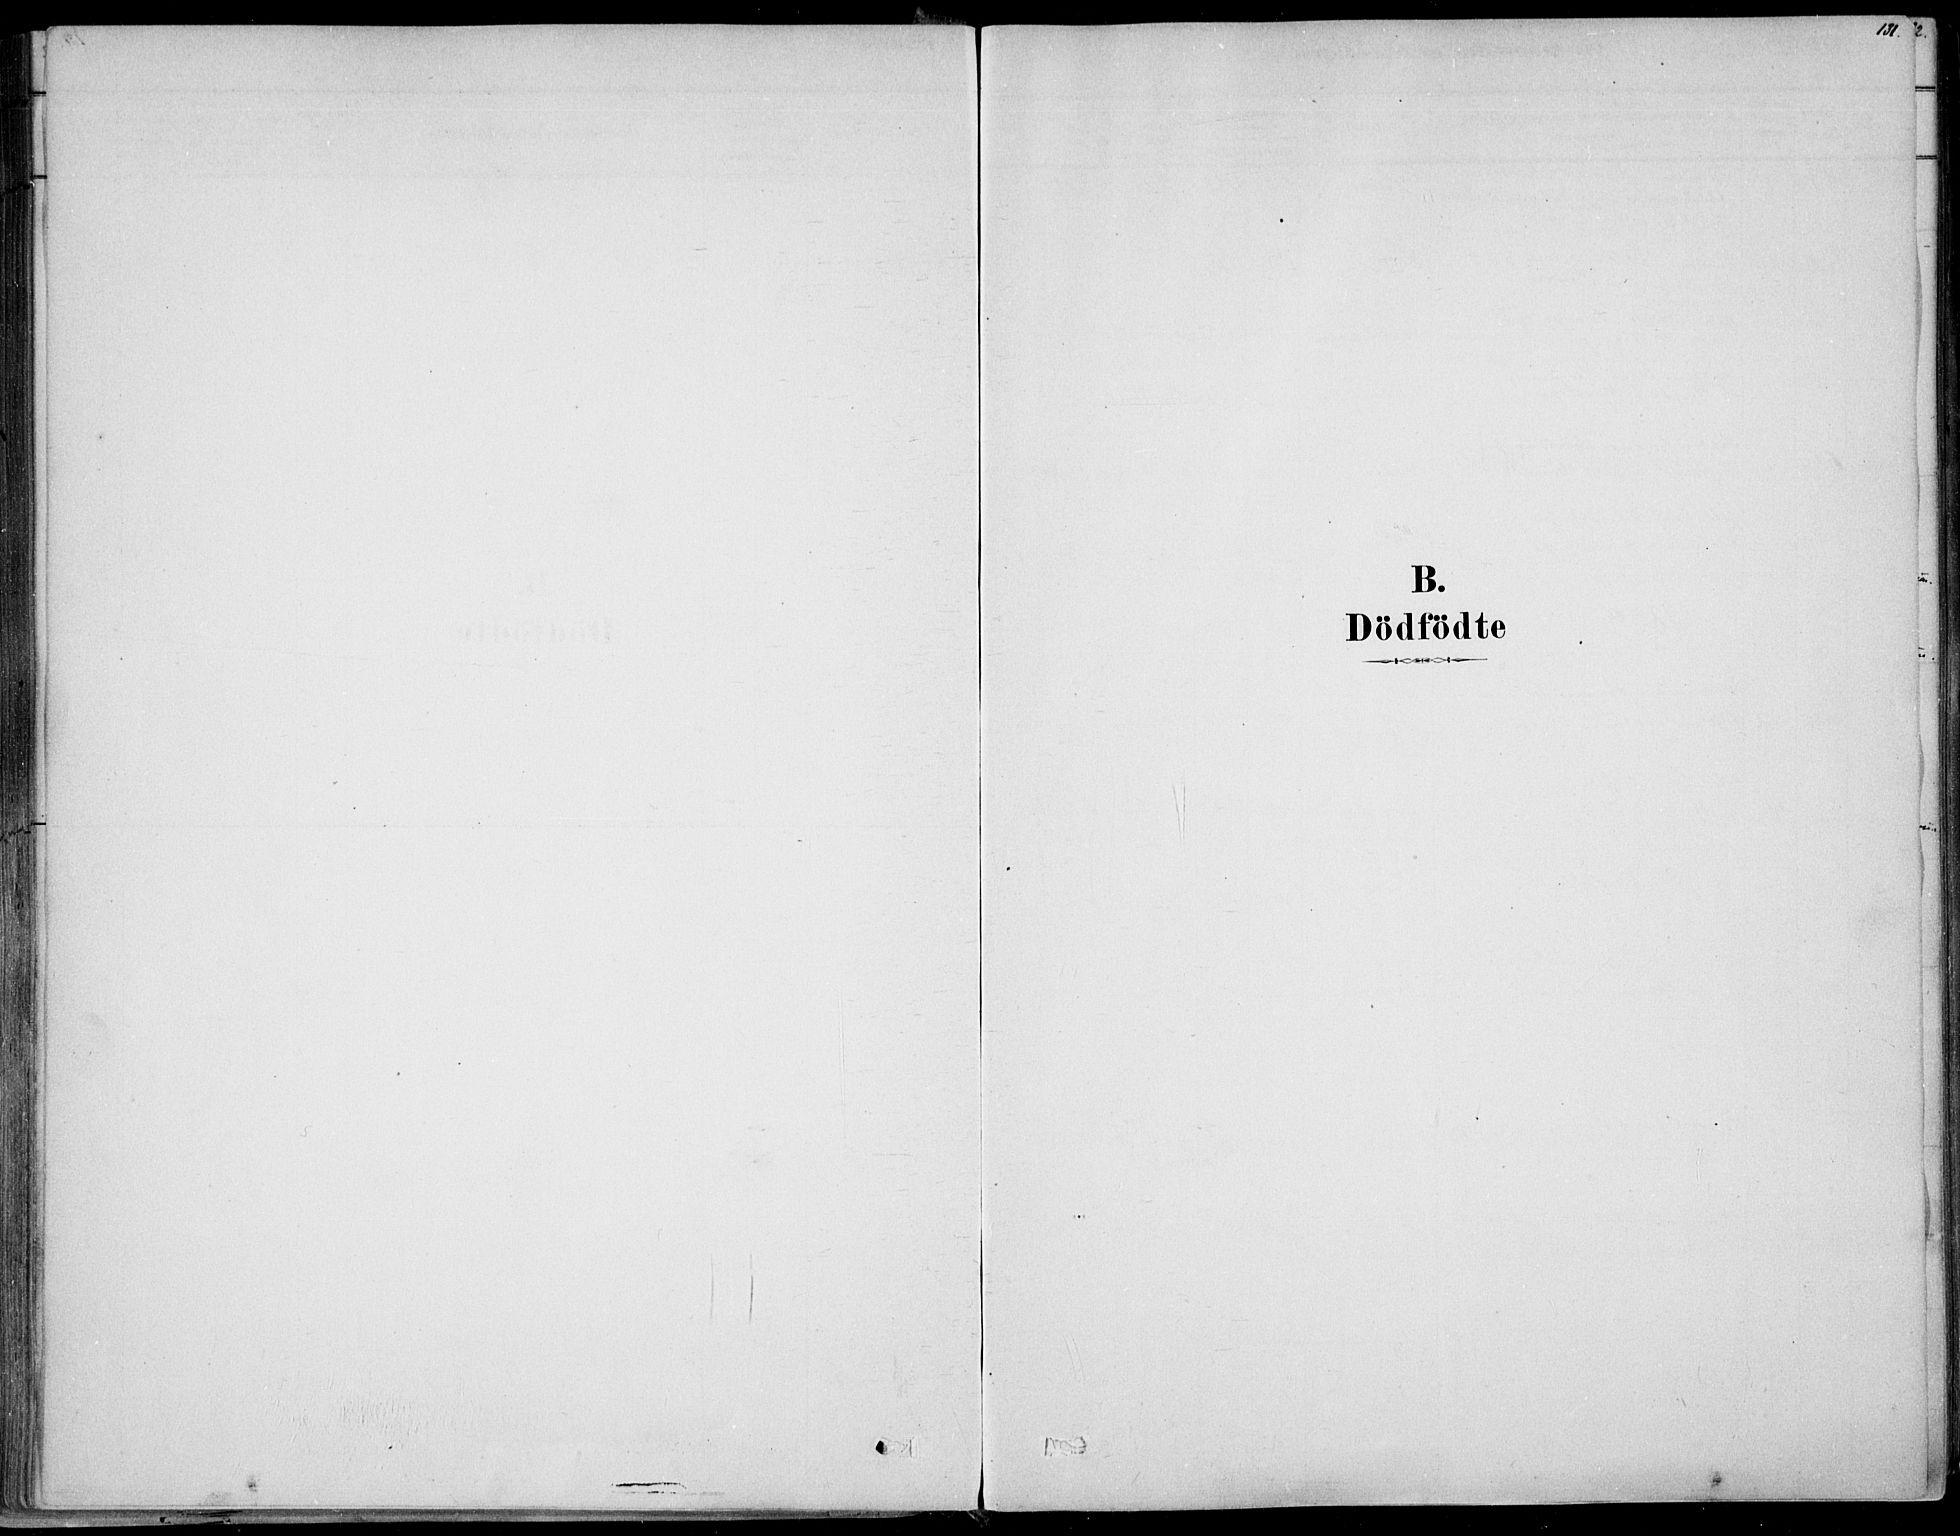 SAKO, Sem kirkebøker, F/Fb/L0004: Ministerialbok nr. II 4, 1878-1891, s. 131